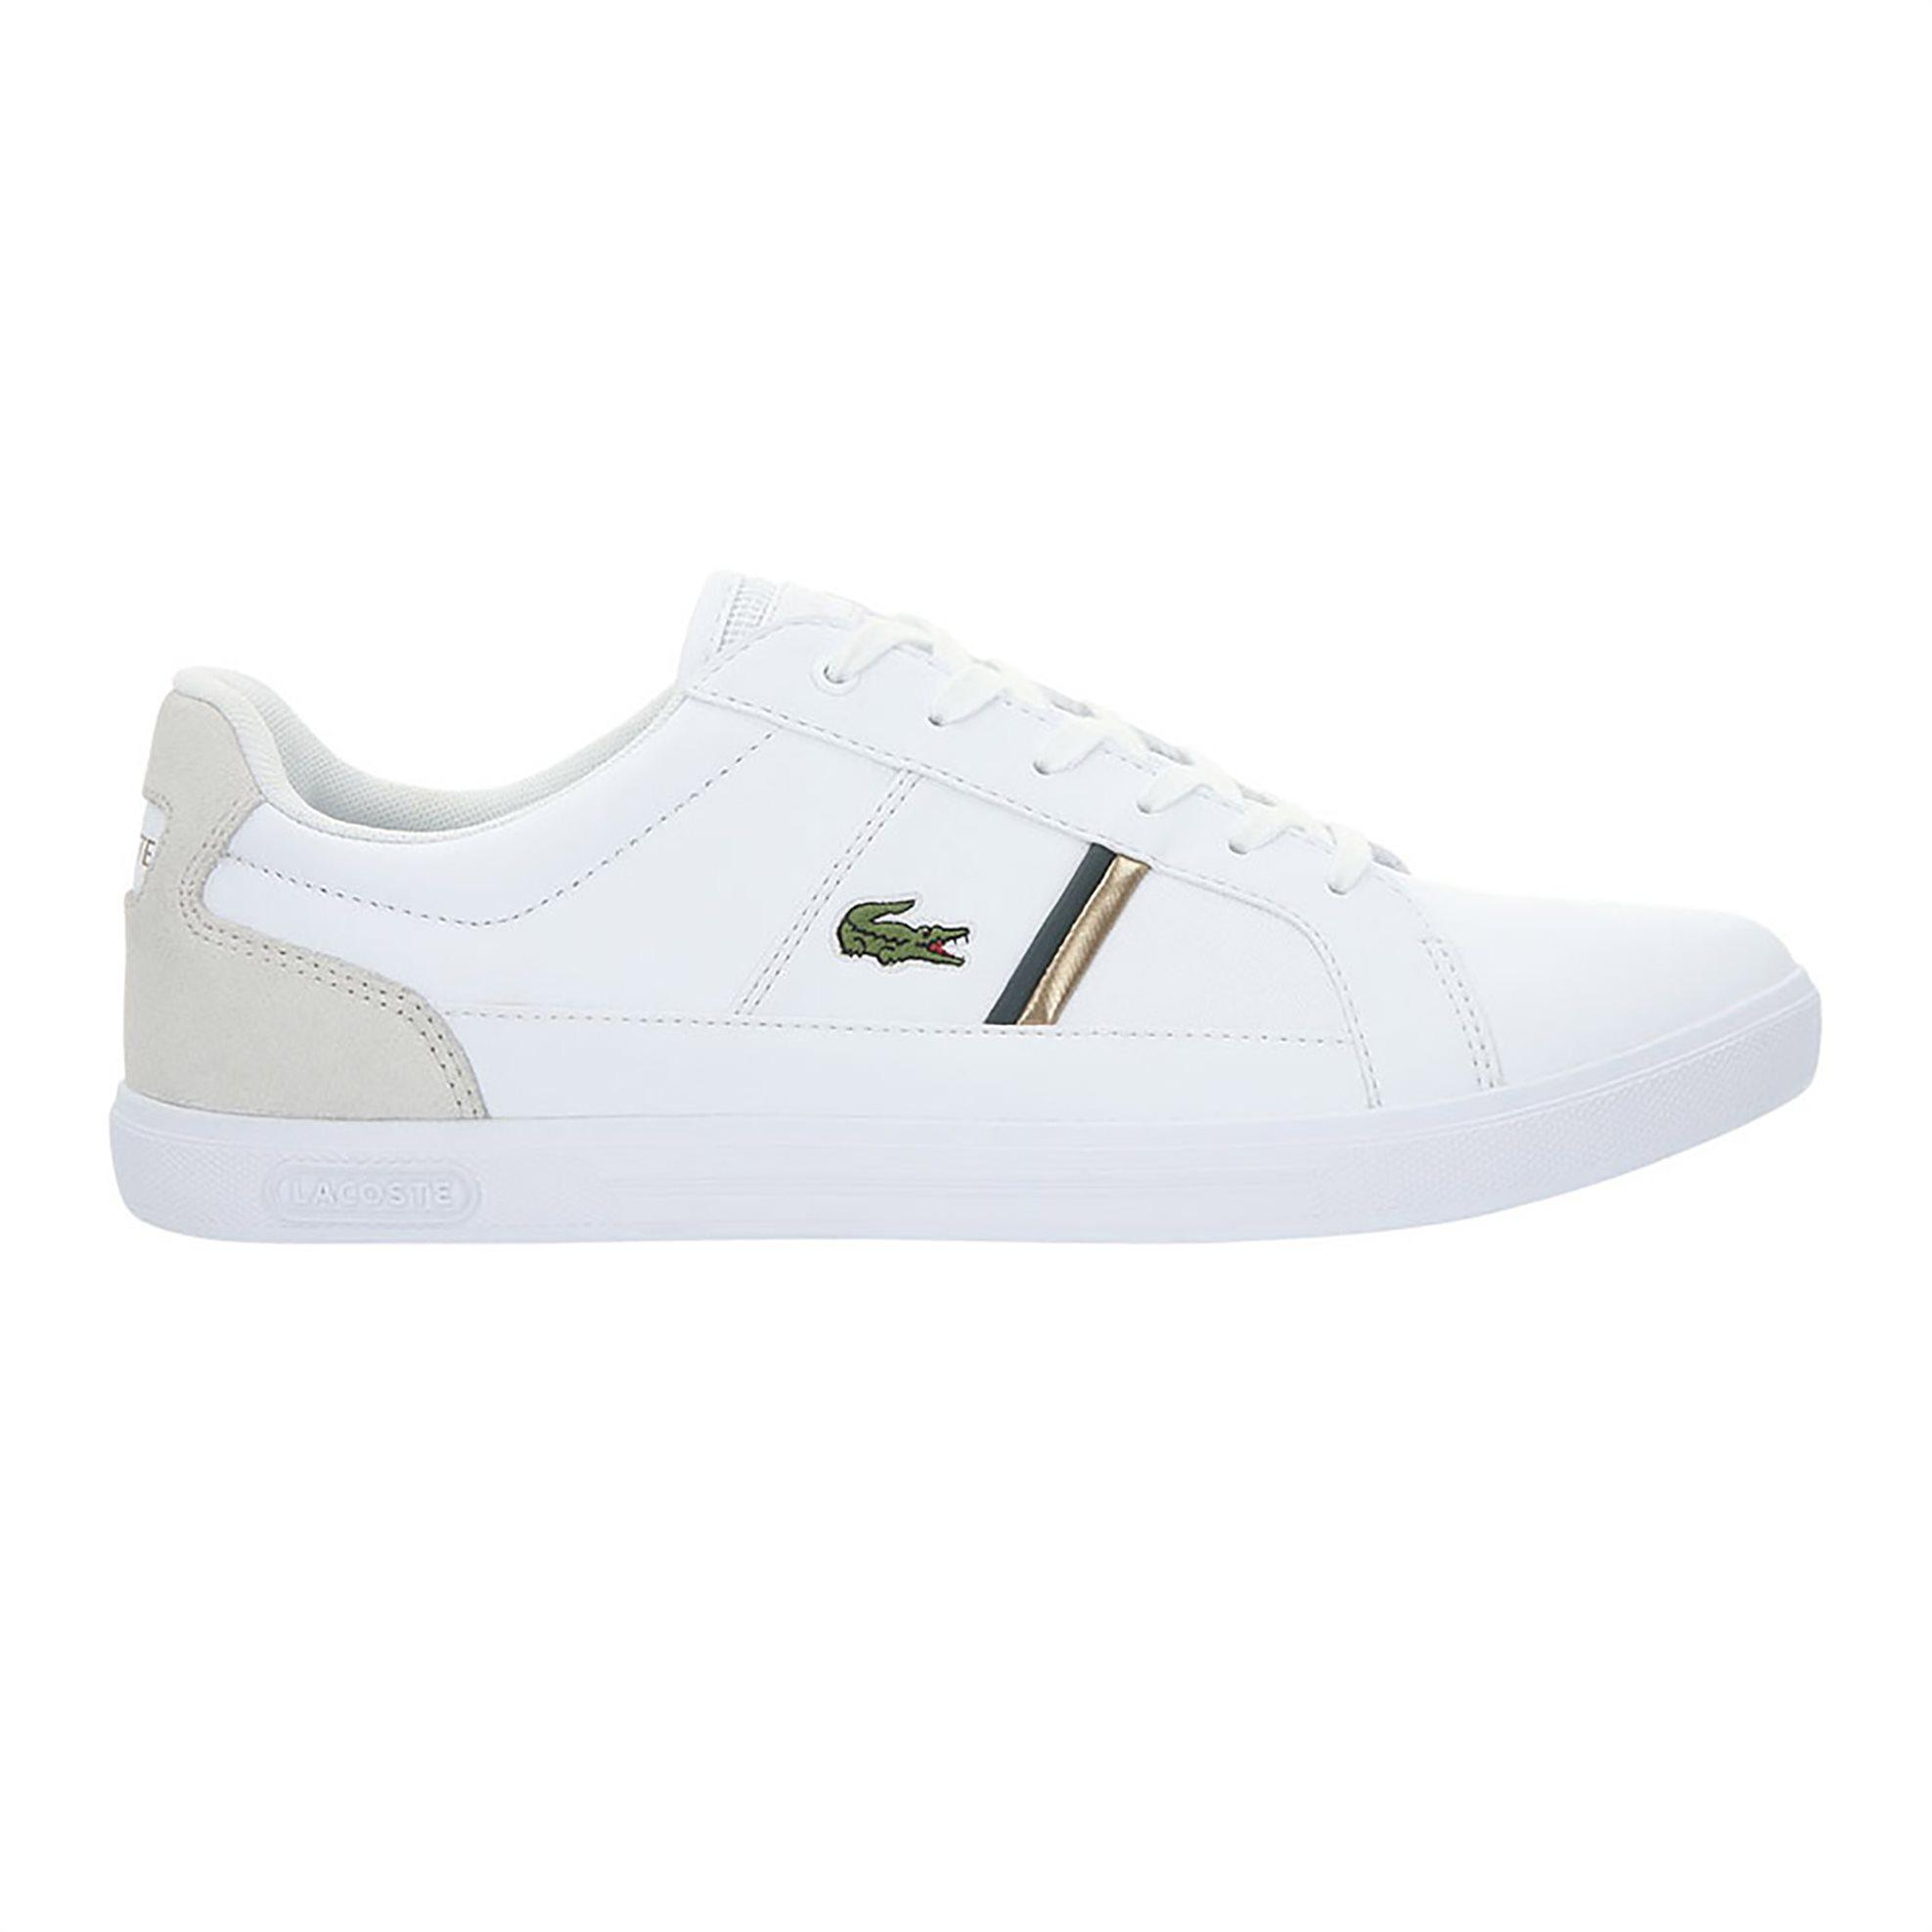 Lacoste ανδρικά sneakers με κορδόνια και ριγέ λεπτομέρεια Europa – 38SMA00171R5 – Λευκό